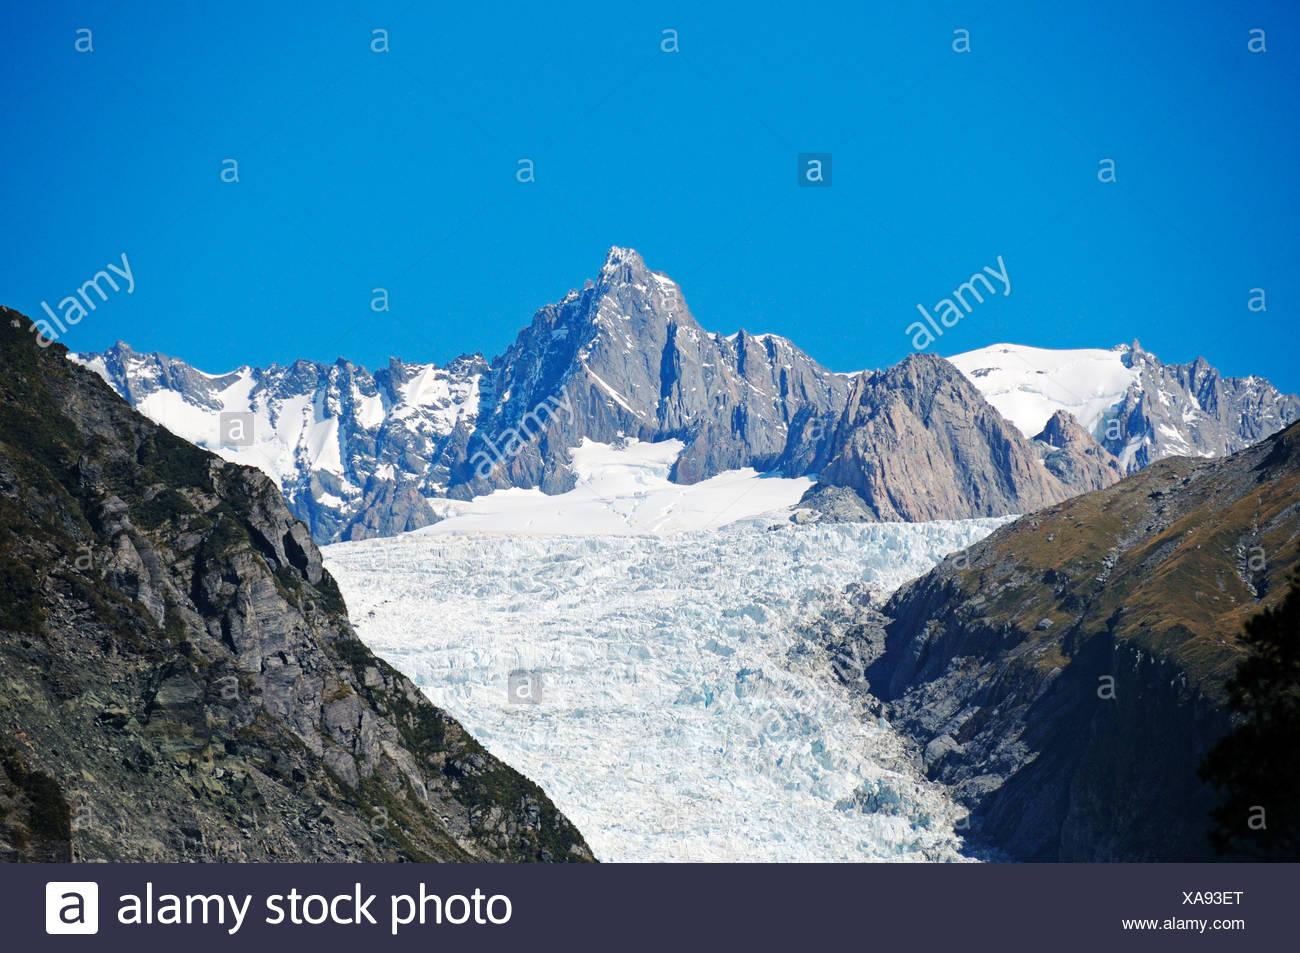 Fox Glacier, Te o Moeka o Tuawe, in Westland National Park, South Island of New Zealand - Stock Image